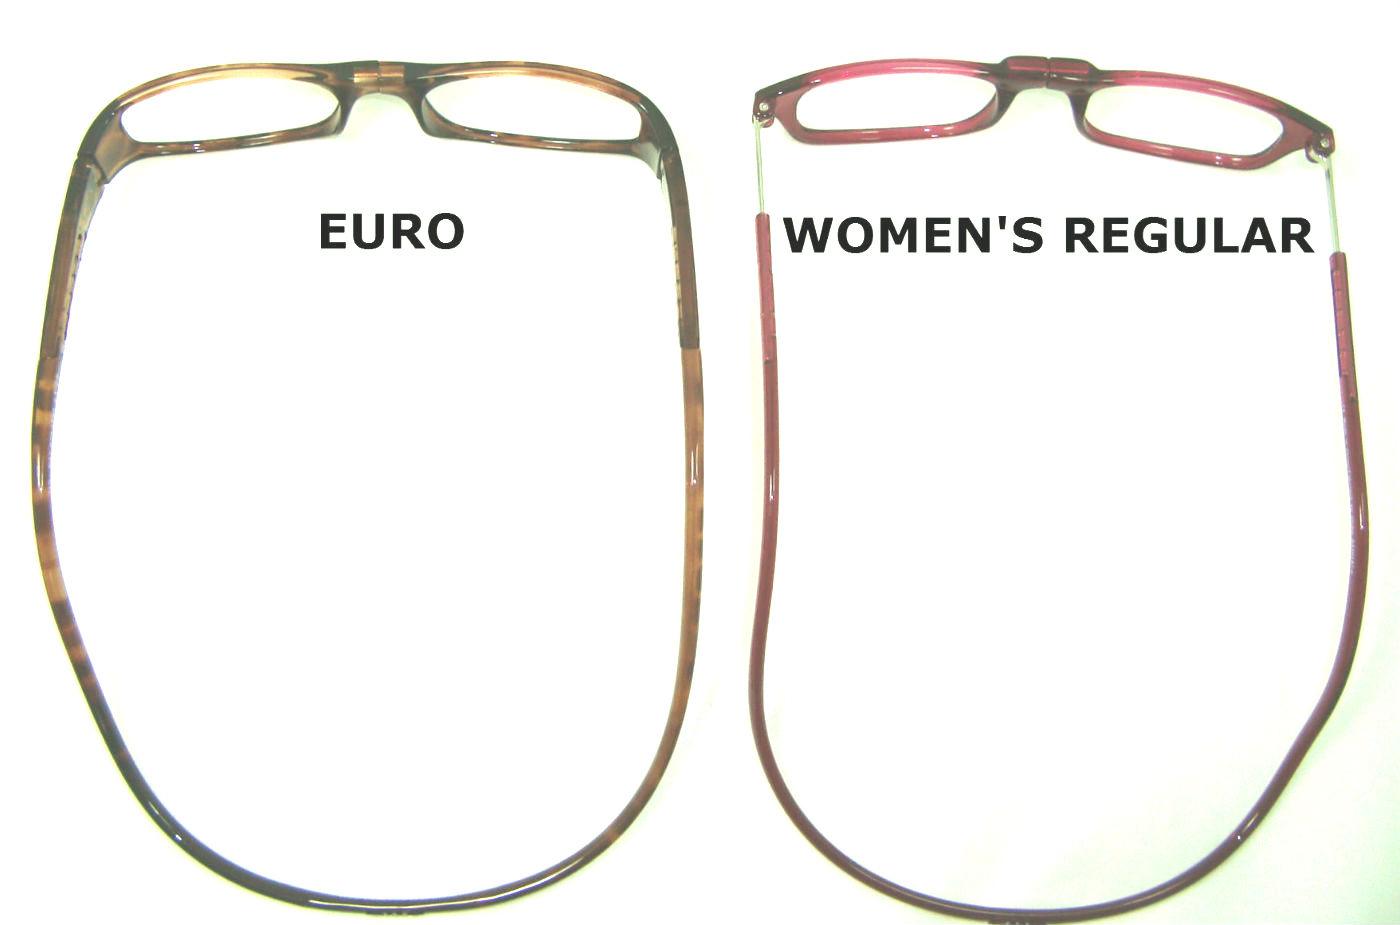 EURO&WOMEN'S REGULAR WEB 2